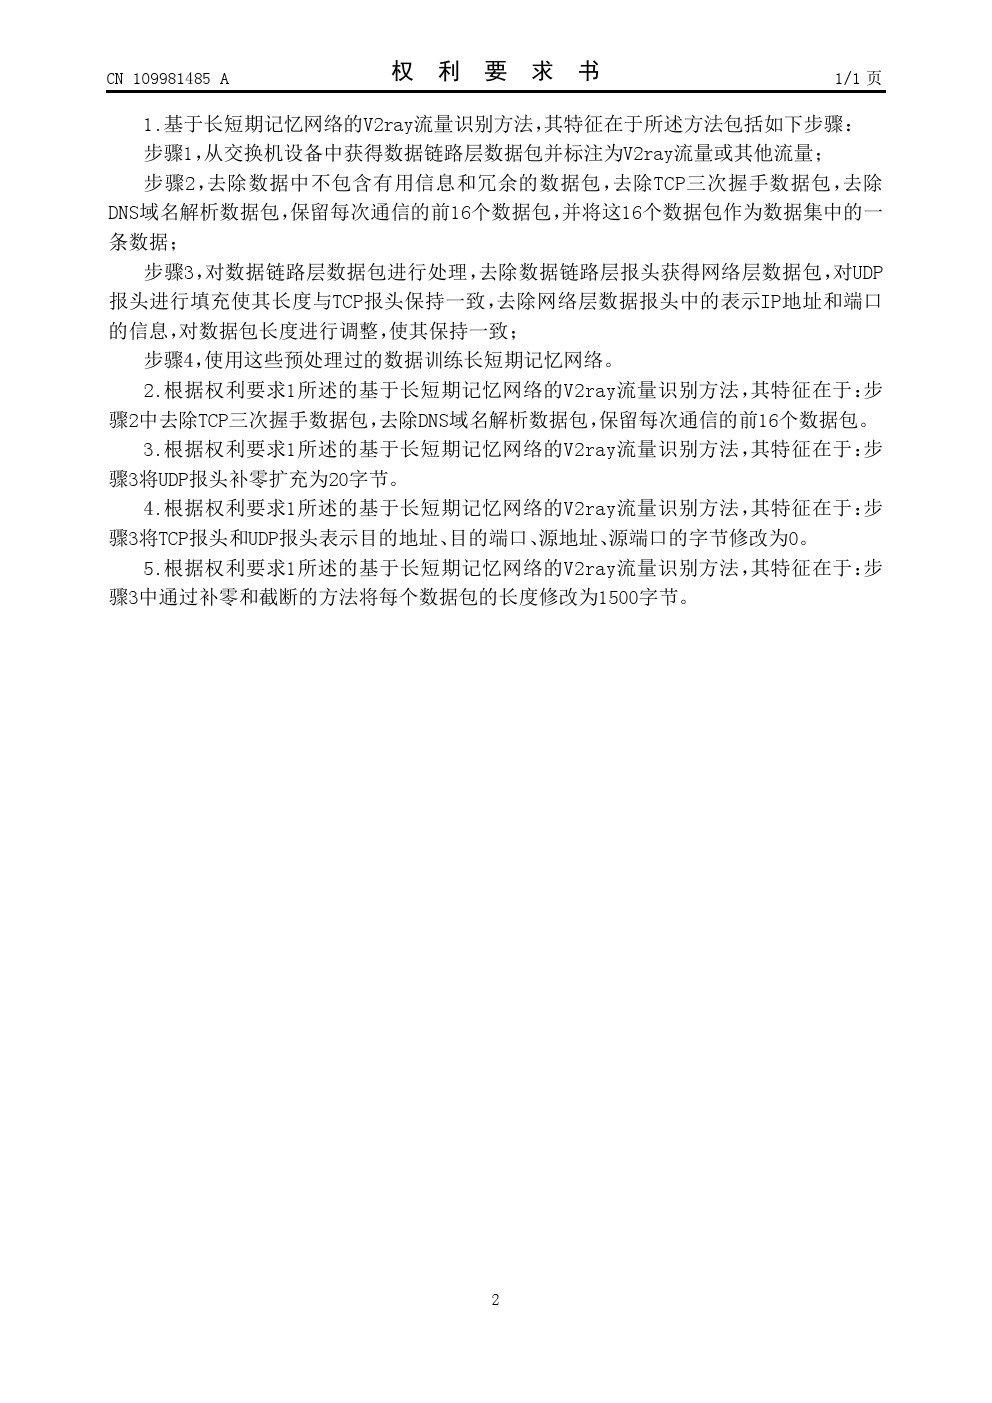 V2ray流量识别方法专利-2